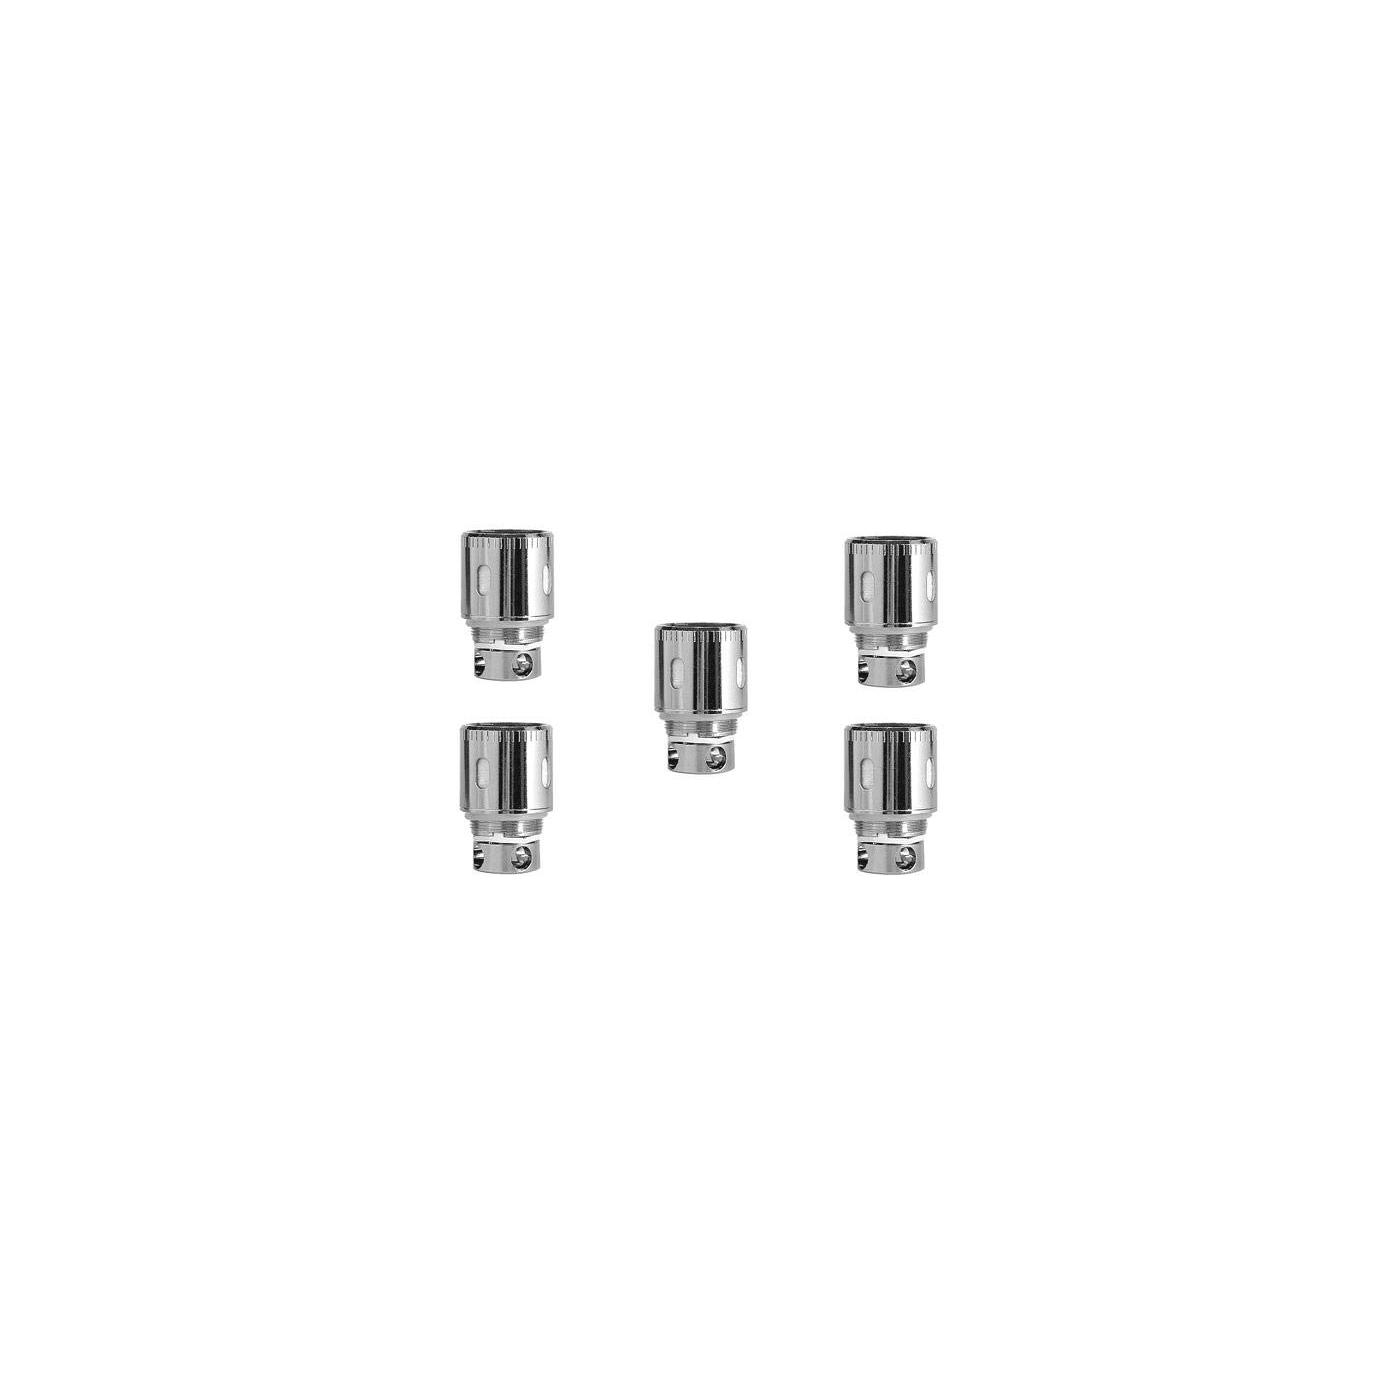 Horizon Tech Arctic V8 coil - 5 pack